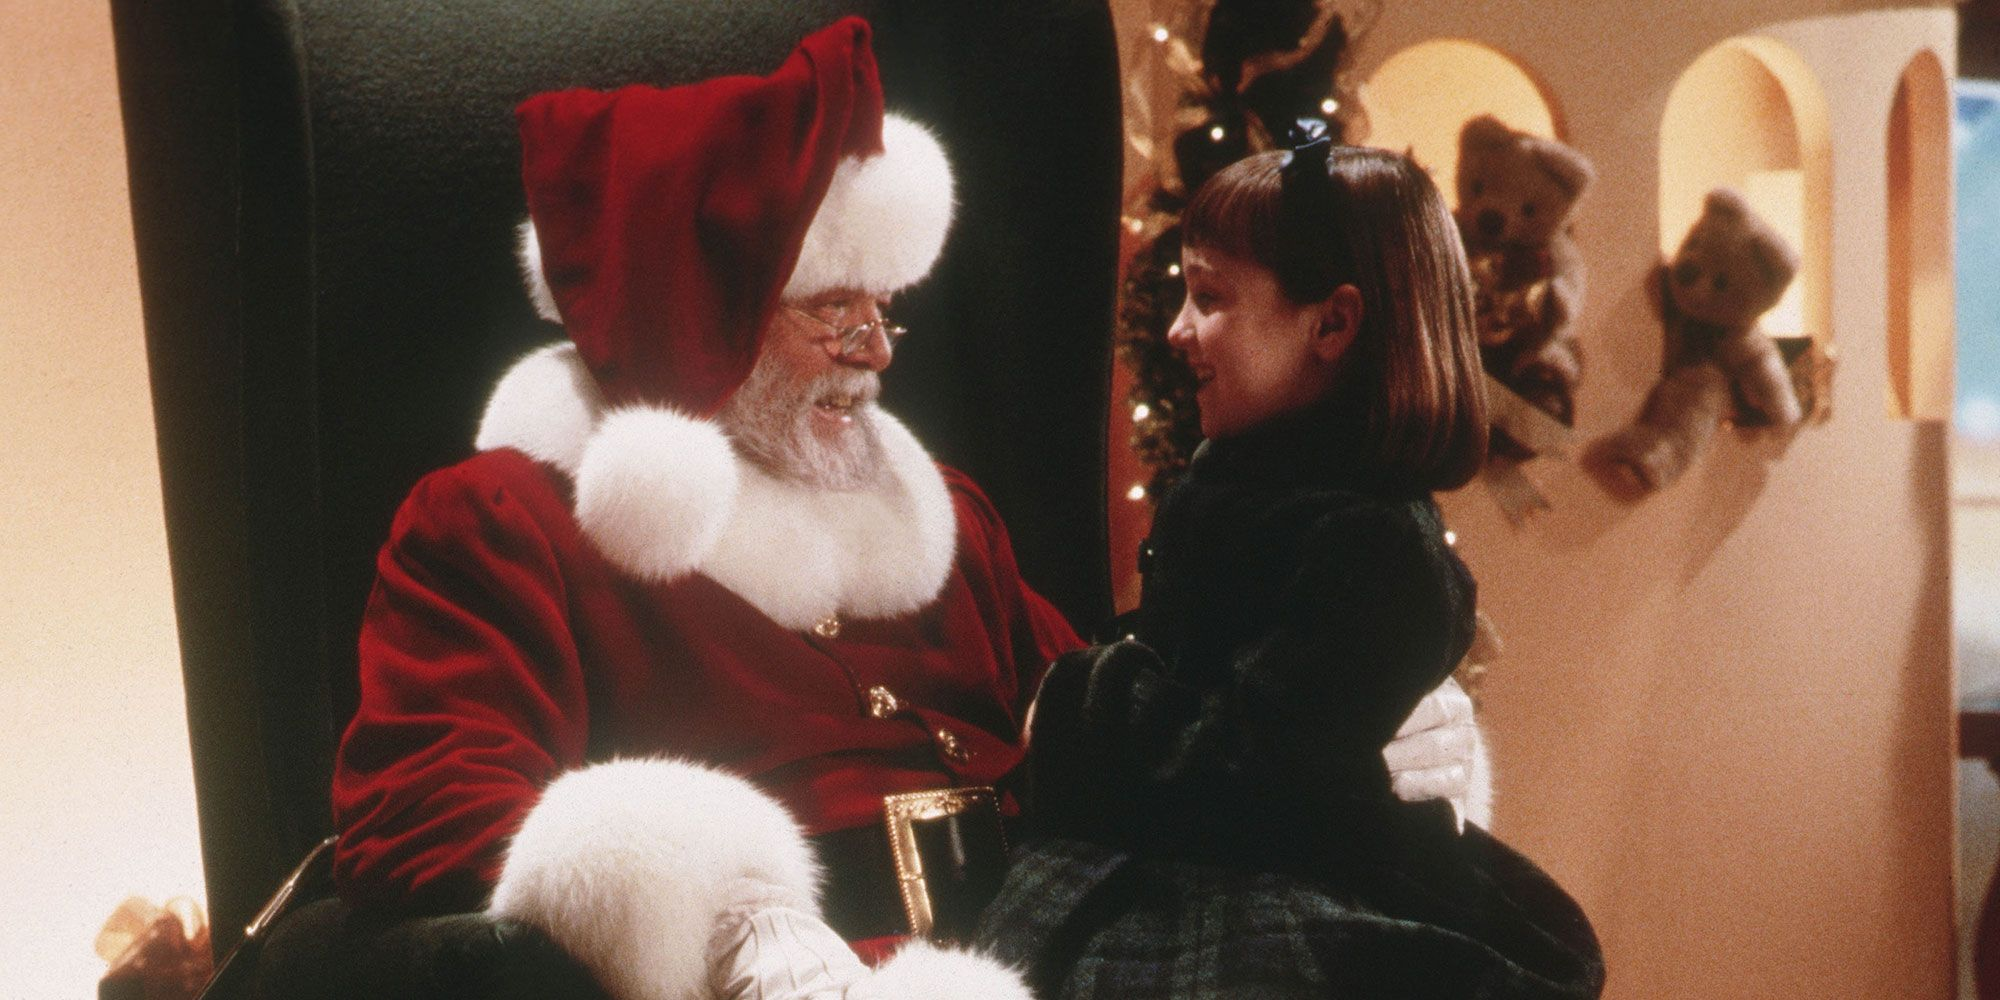 Santa - Miracle on 34th street